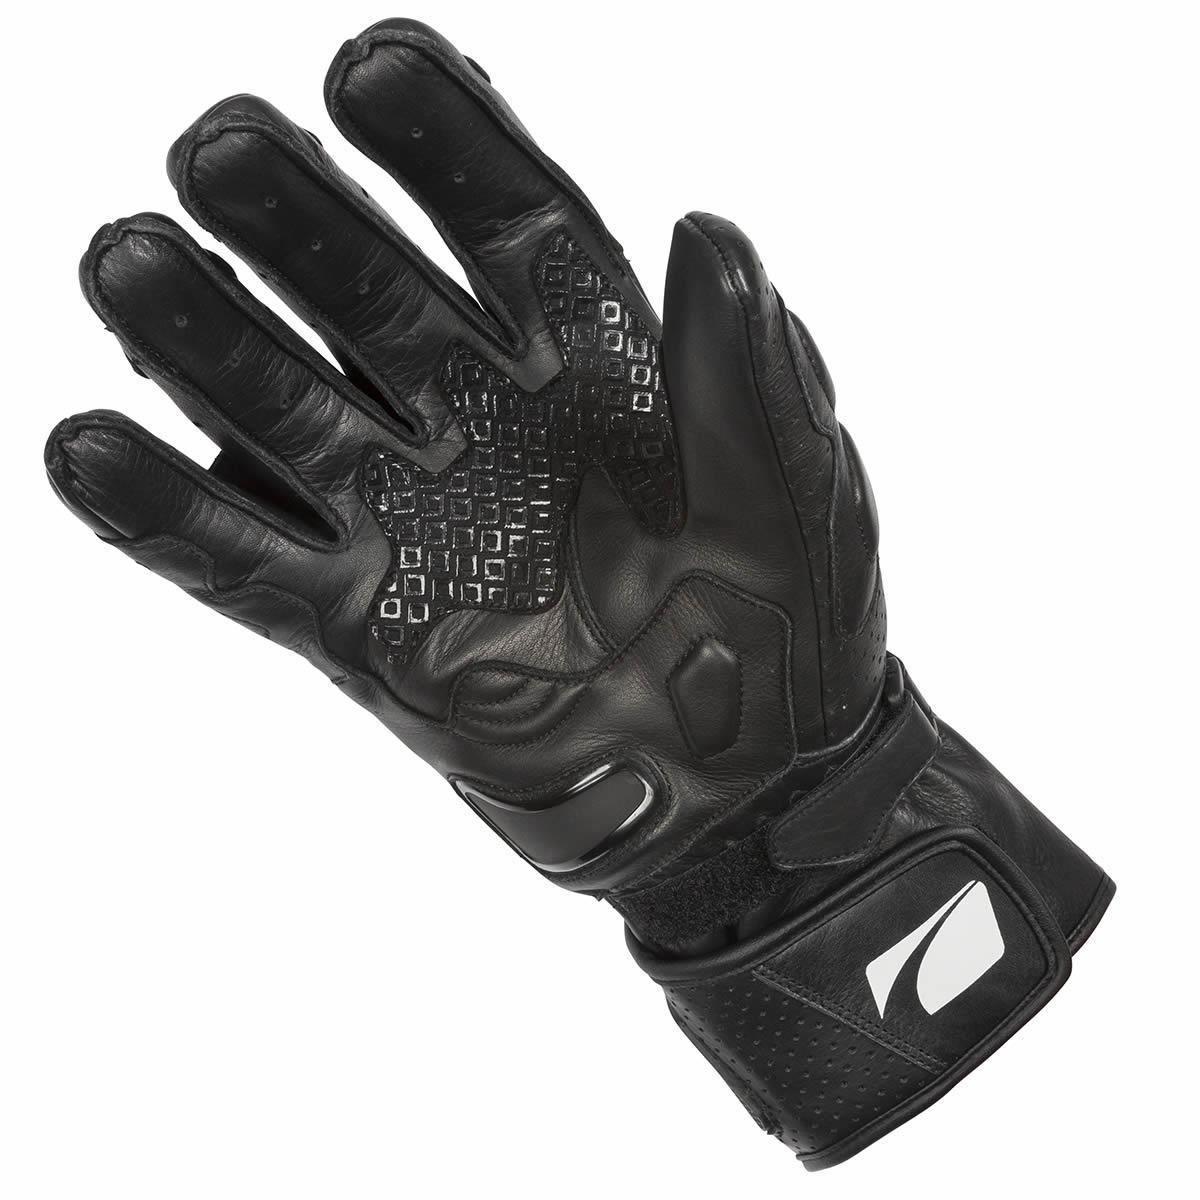 Spada-Covert-Ce-Gants-Moto-Cuir-Noir-Racing-Renforce miniature 11